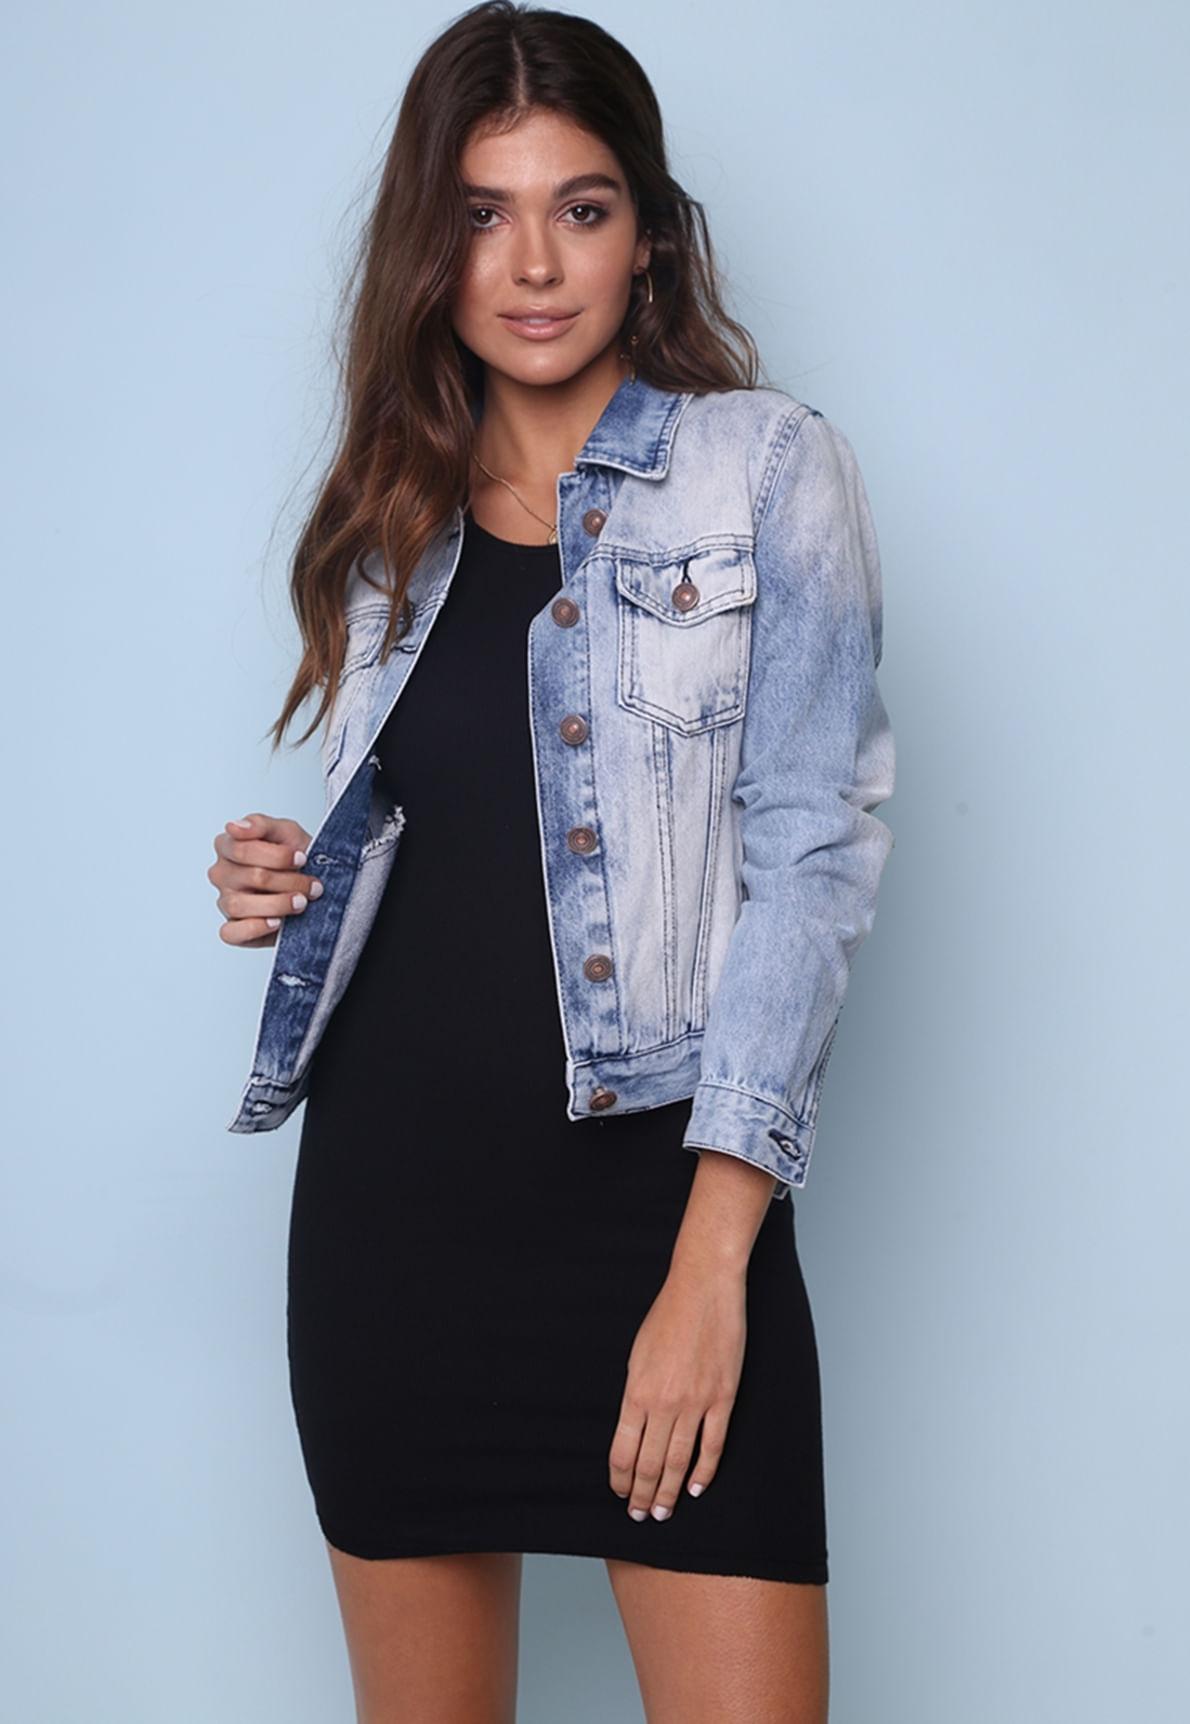 21345-jaqueta-jeans-stormi-mundo-lolita-02